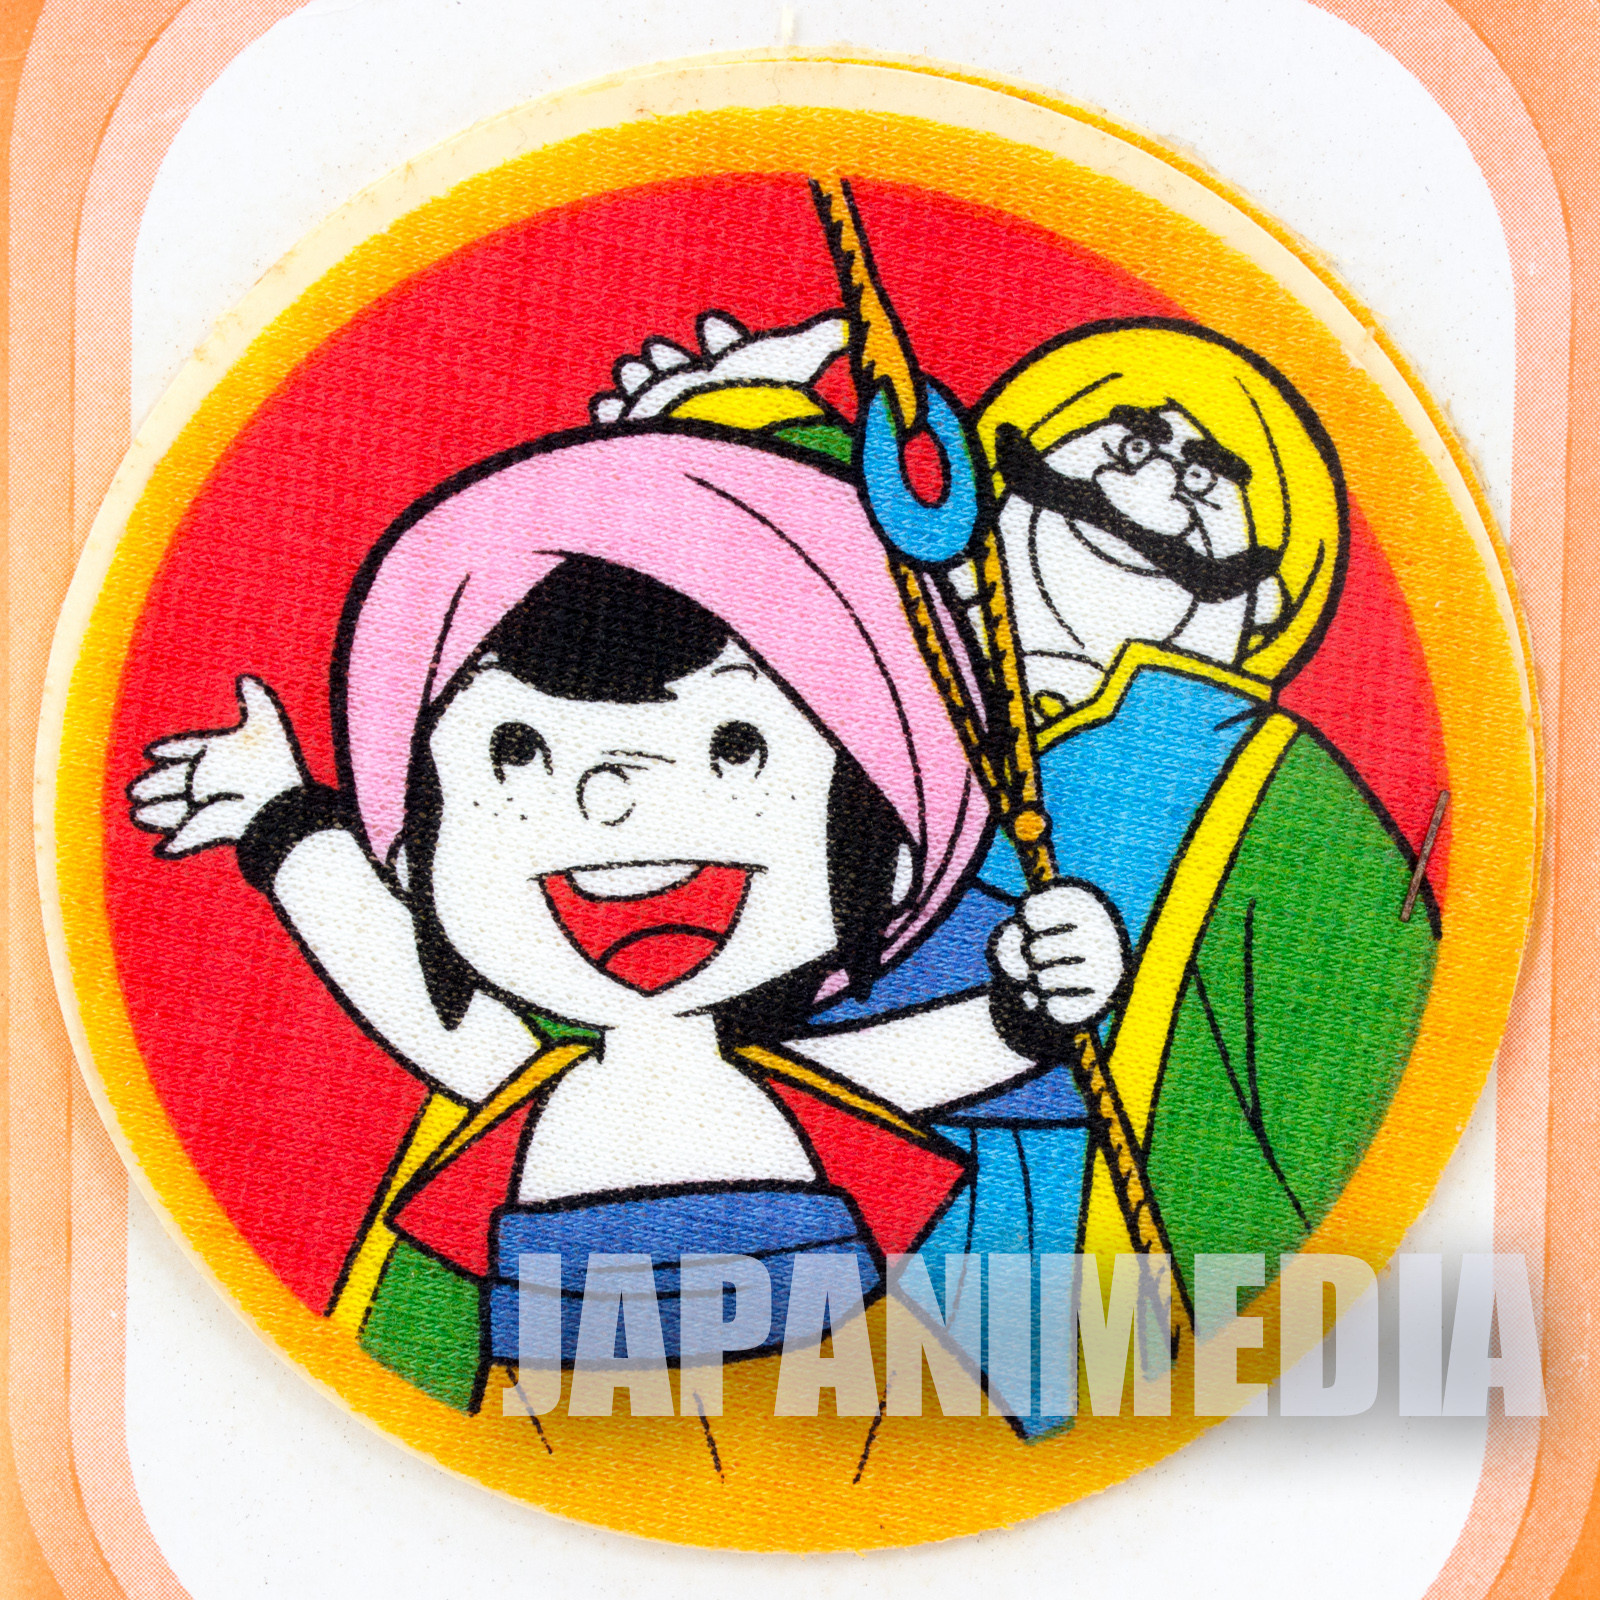 Retro Rare!! Arabian Nights: Adventures of Sindbad Emblem Badge Wappen 2pc set JAPAN ANIME 3